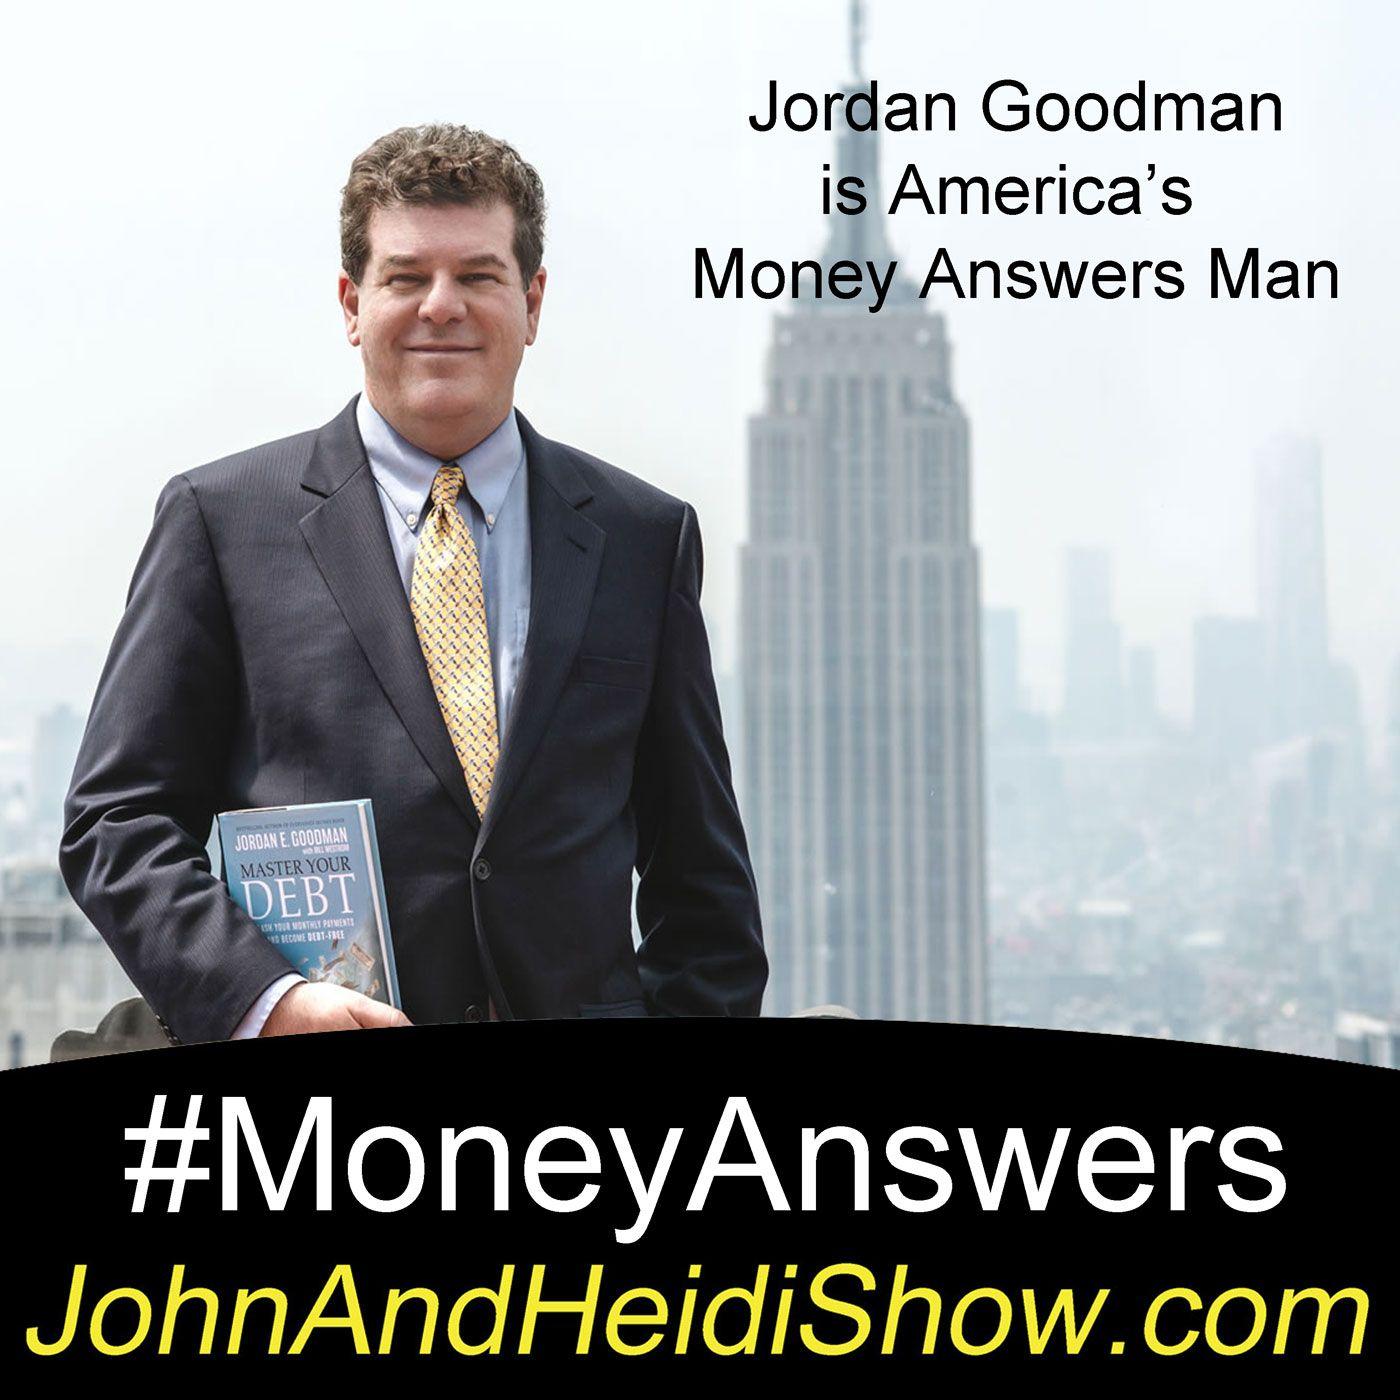 09-19-20-John And Heidi Show-JordanGoodman